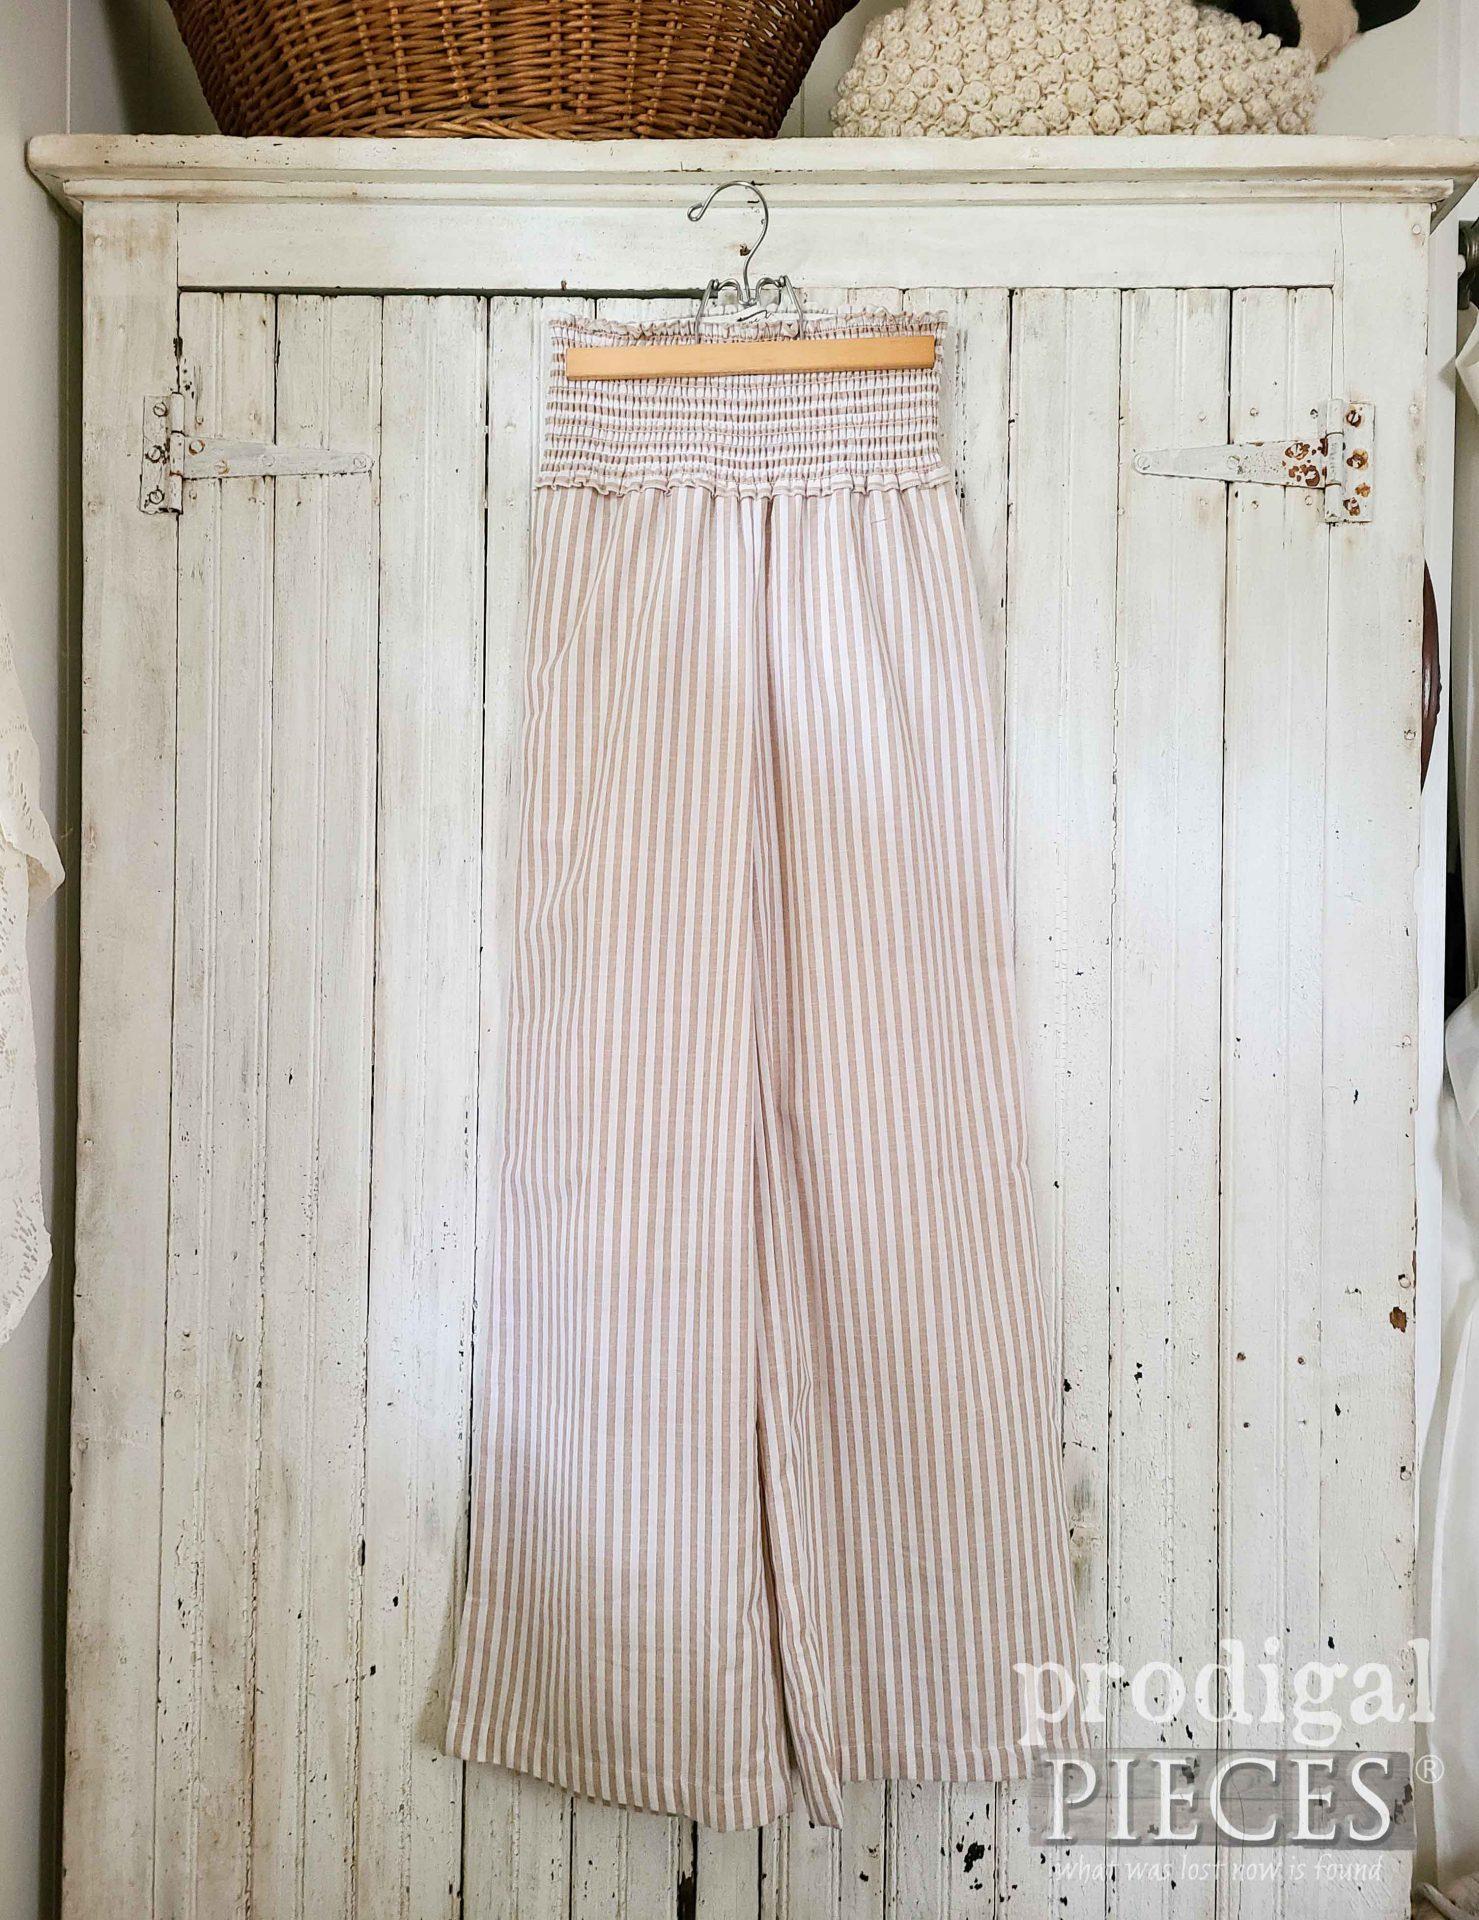 Striped Cotton Pants Before Refashion by Larissa of Prodigal Pieces | prodigalpieces.com